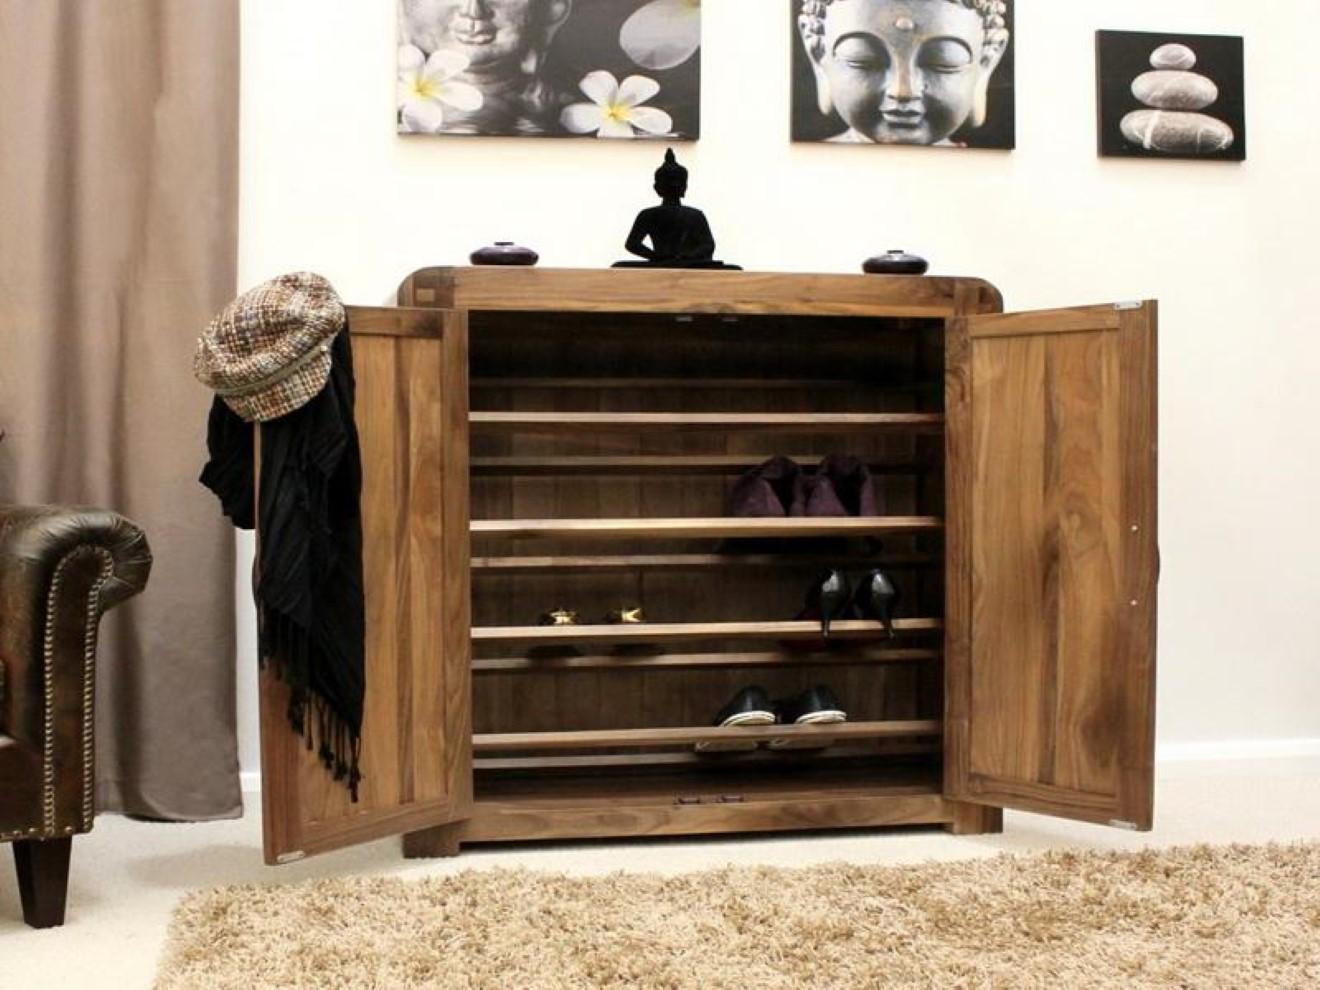 Shoe Storage In The Entry Stylish Shelving Idea